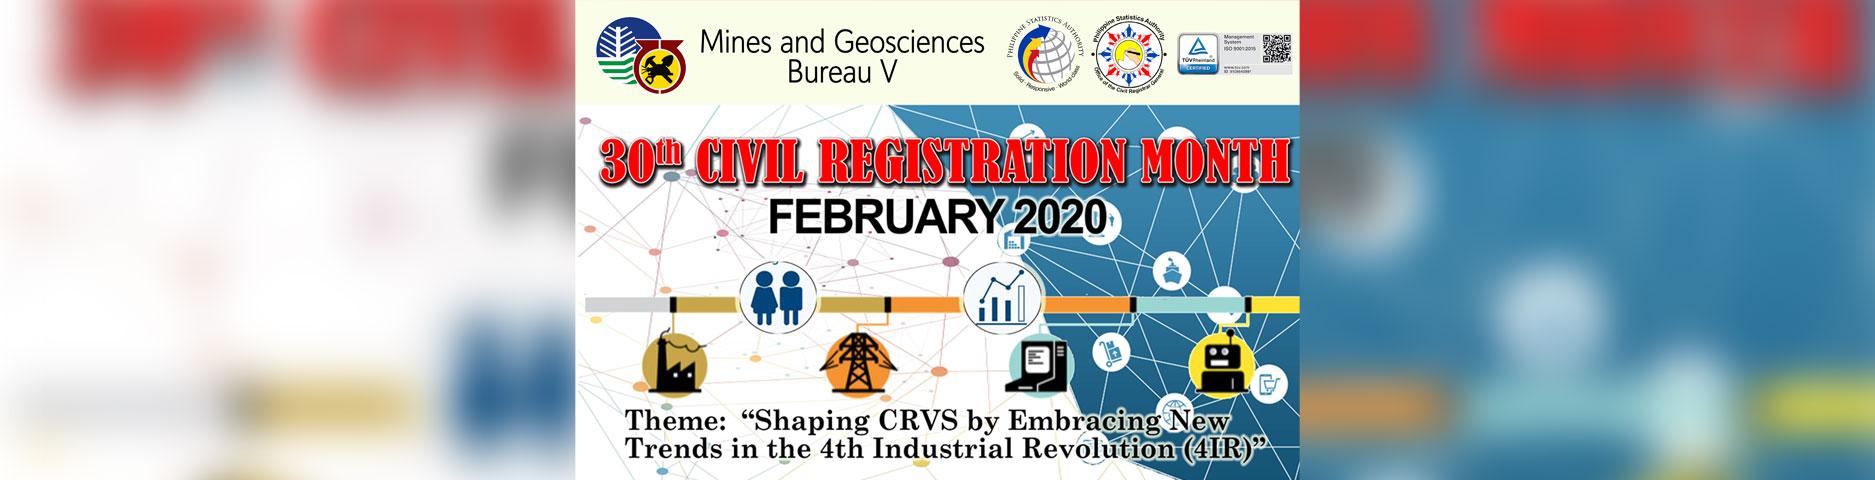 Civil Registration Month